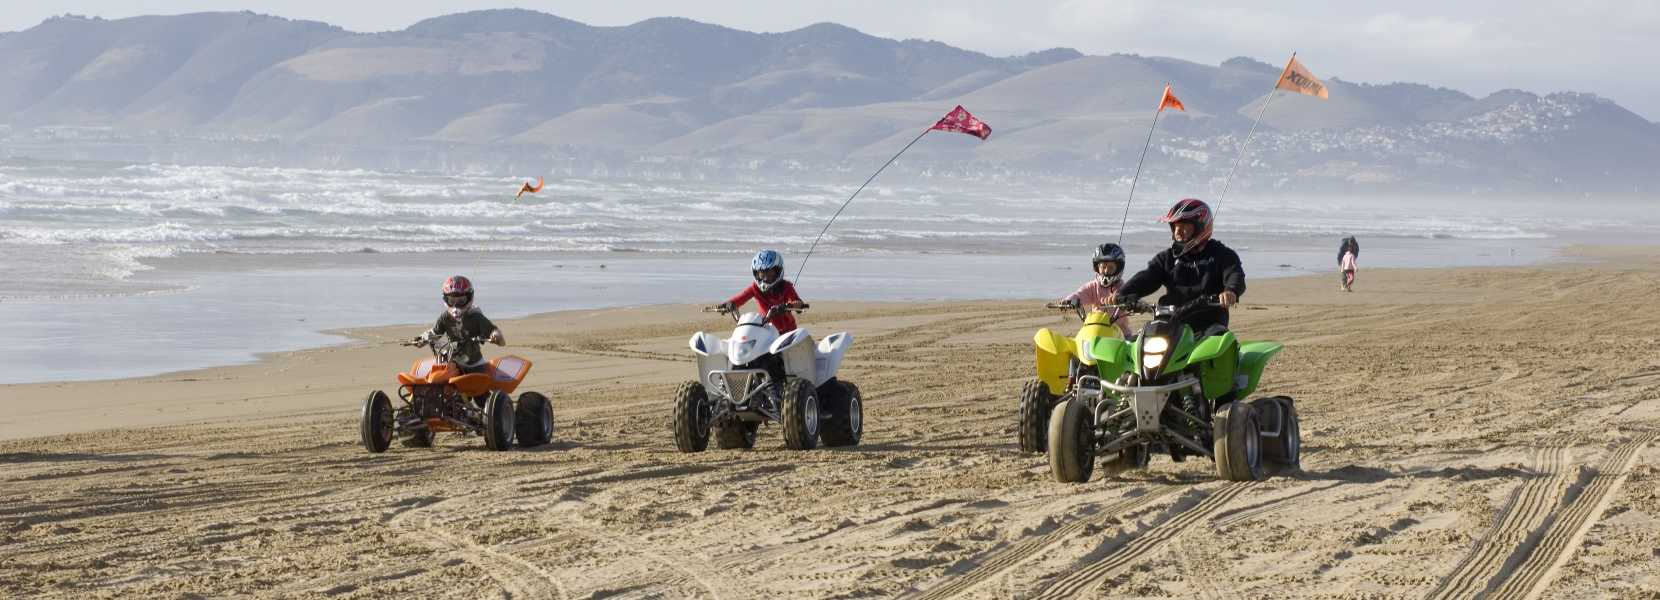 Oceano Dunes   Pismo Beach Sand Dunes & Recreation Area